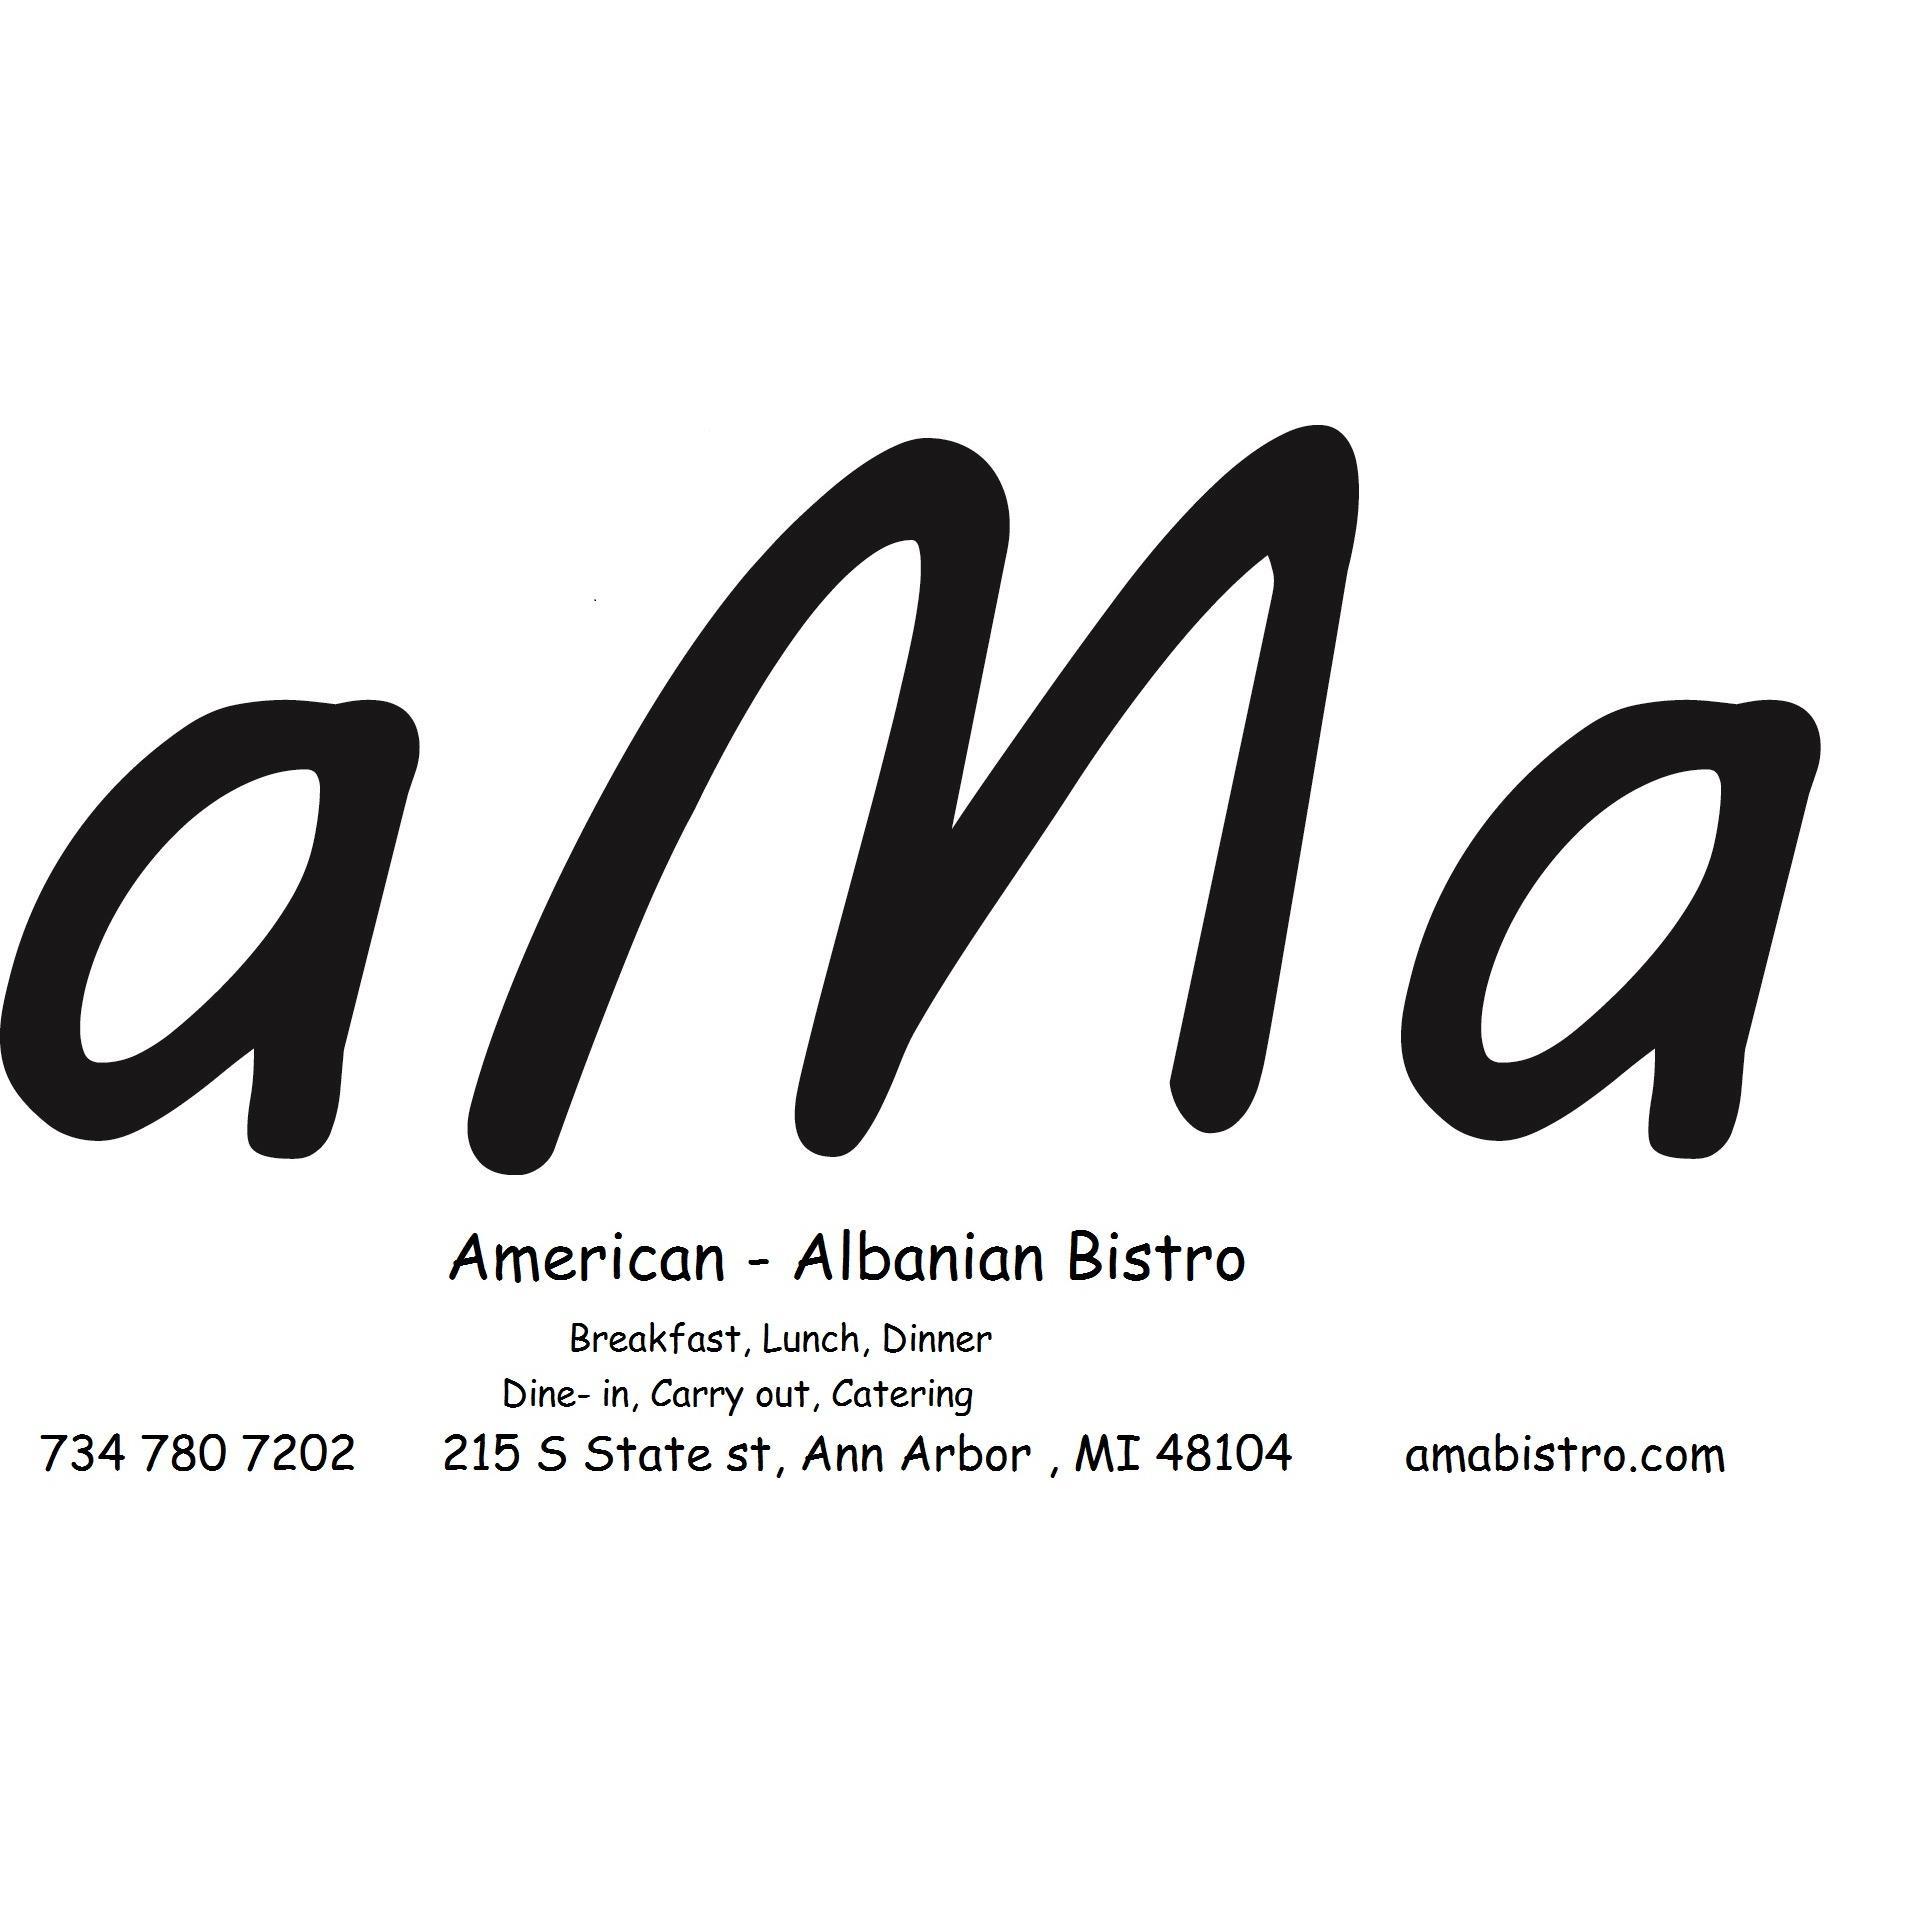 Oak Arbor Grille Pa: Businesses In Ann Arbor, MI